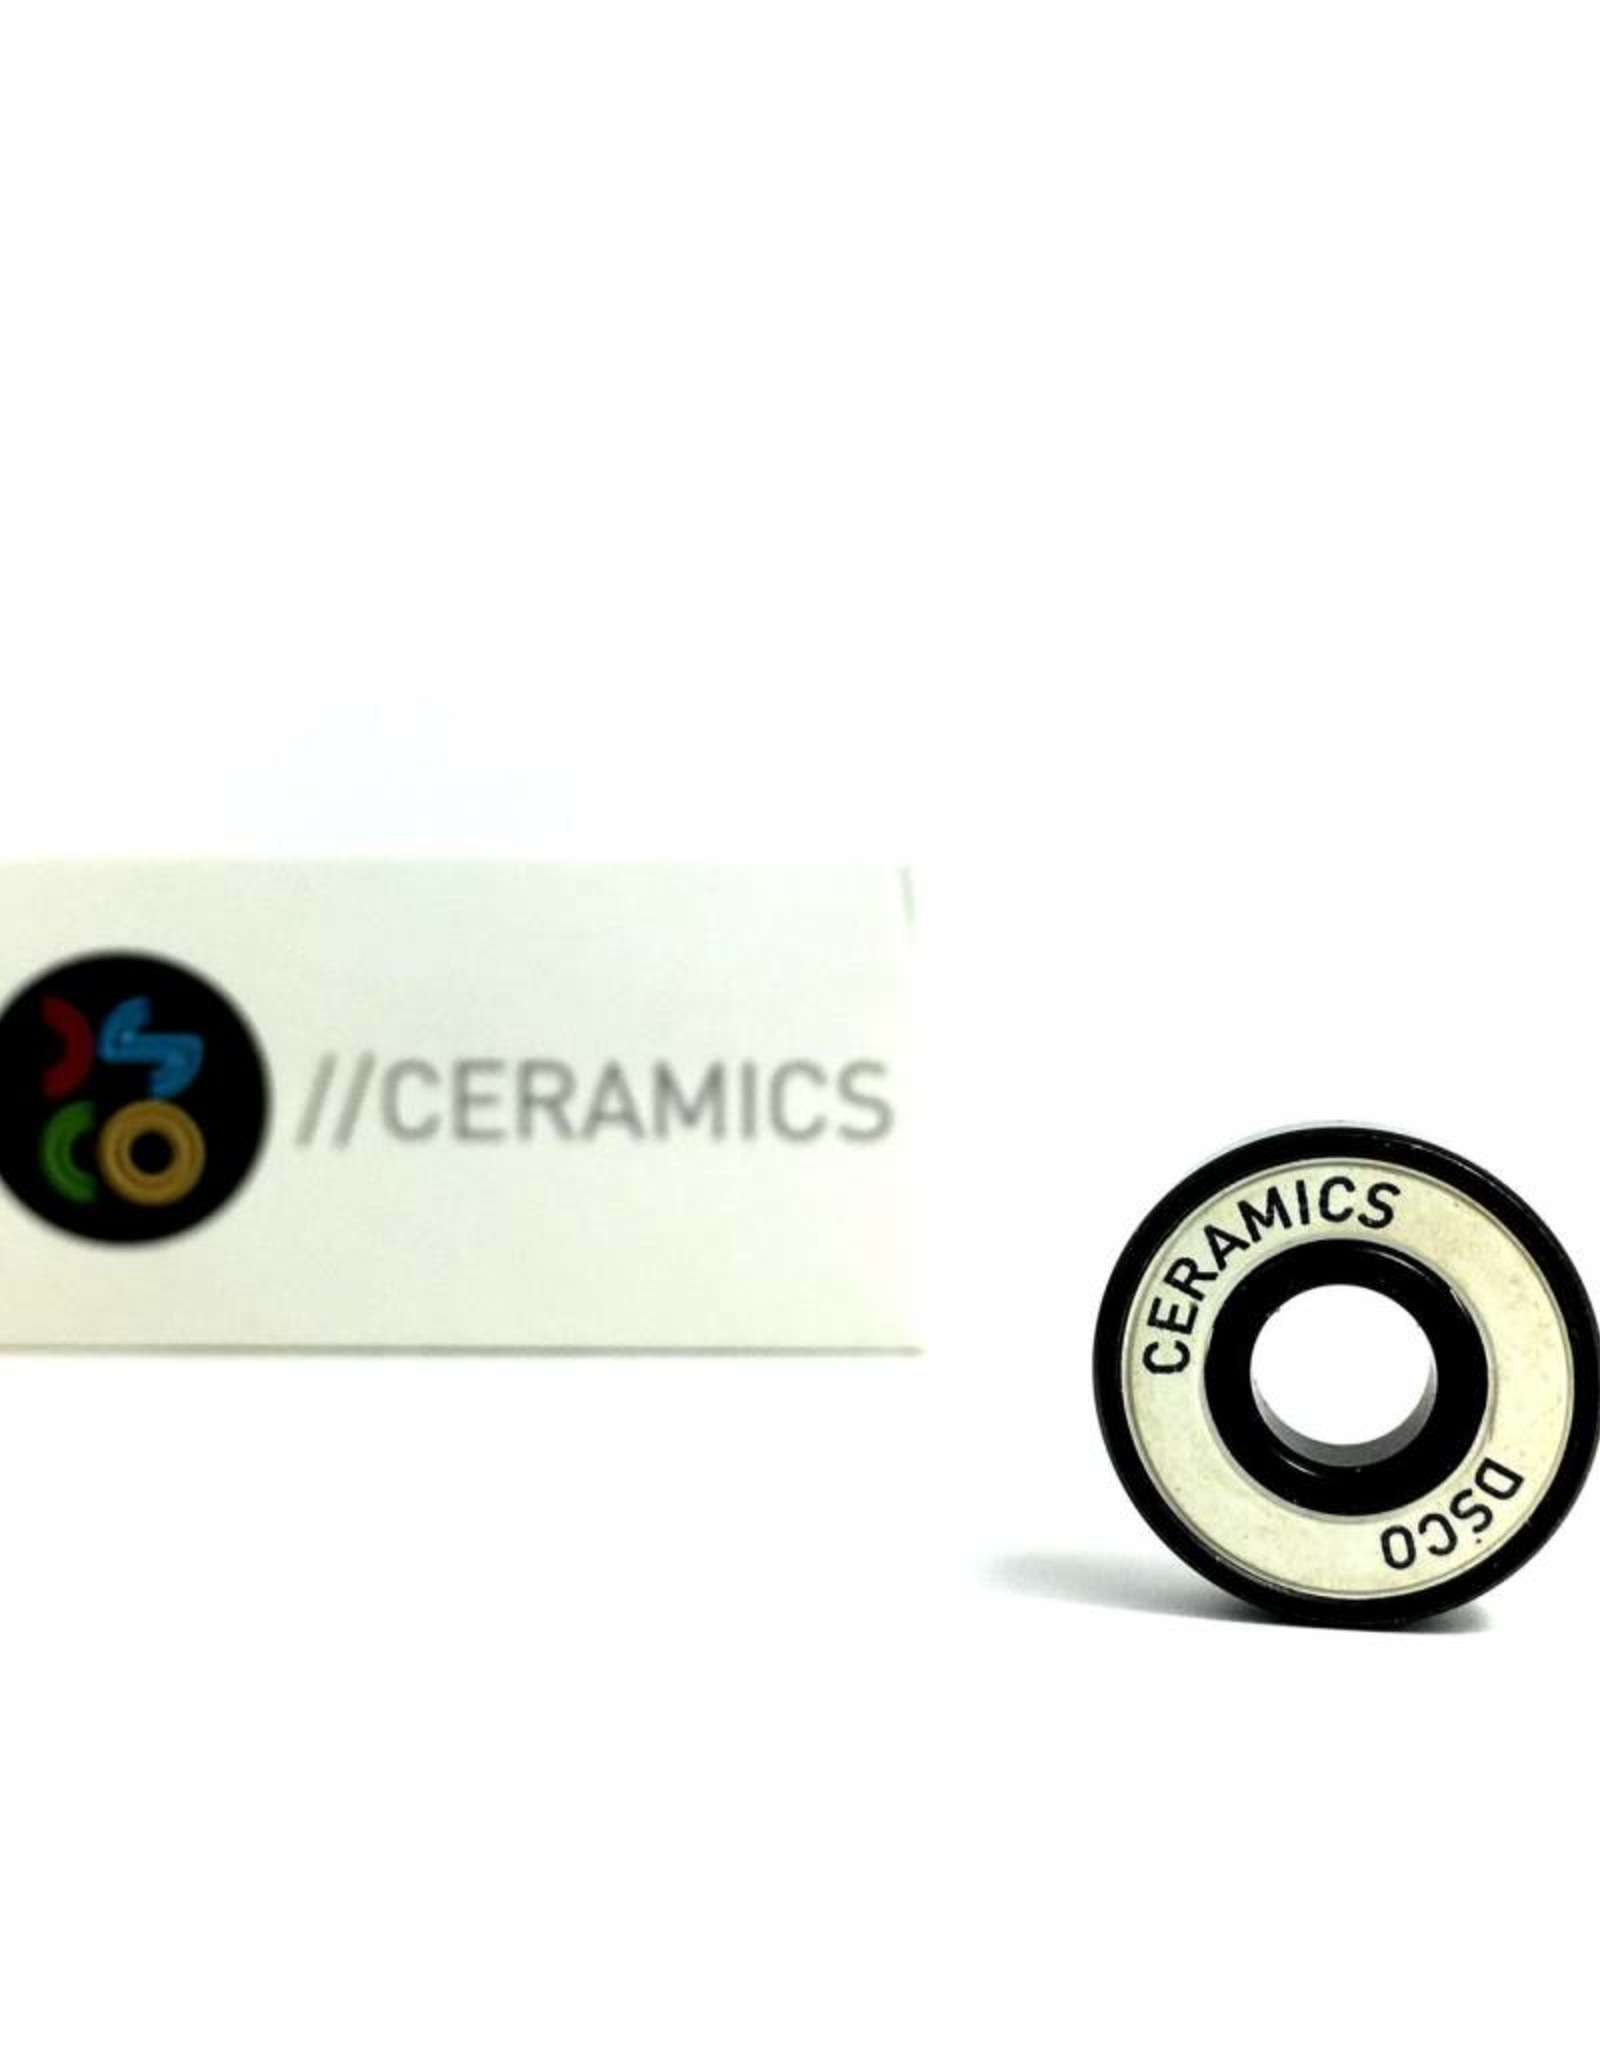 DSCO Bearings DSCO BEARINGS CERAMICS